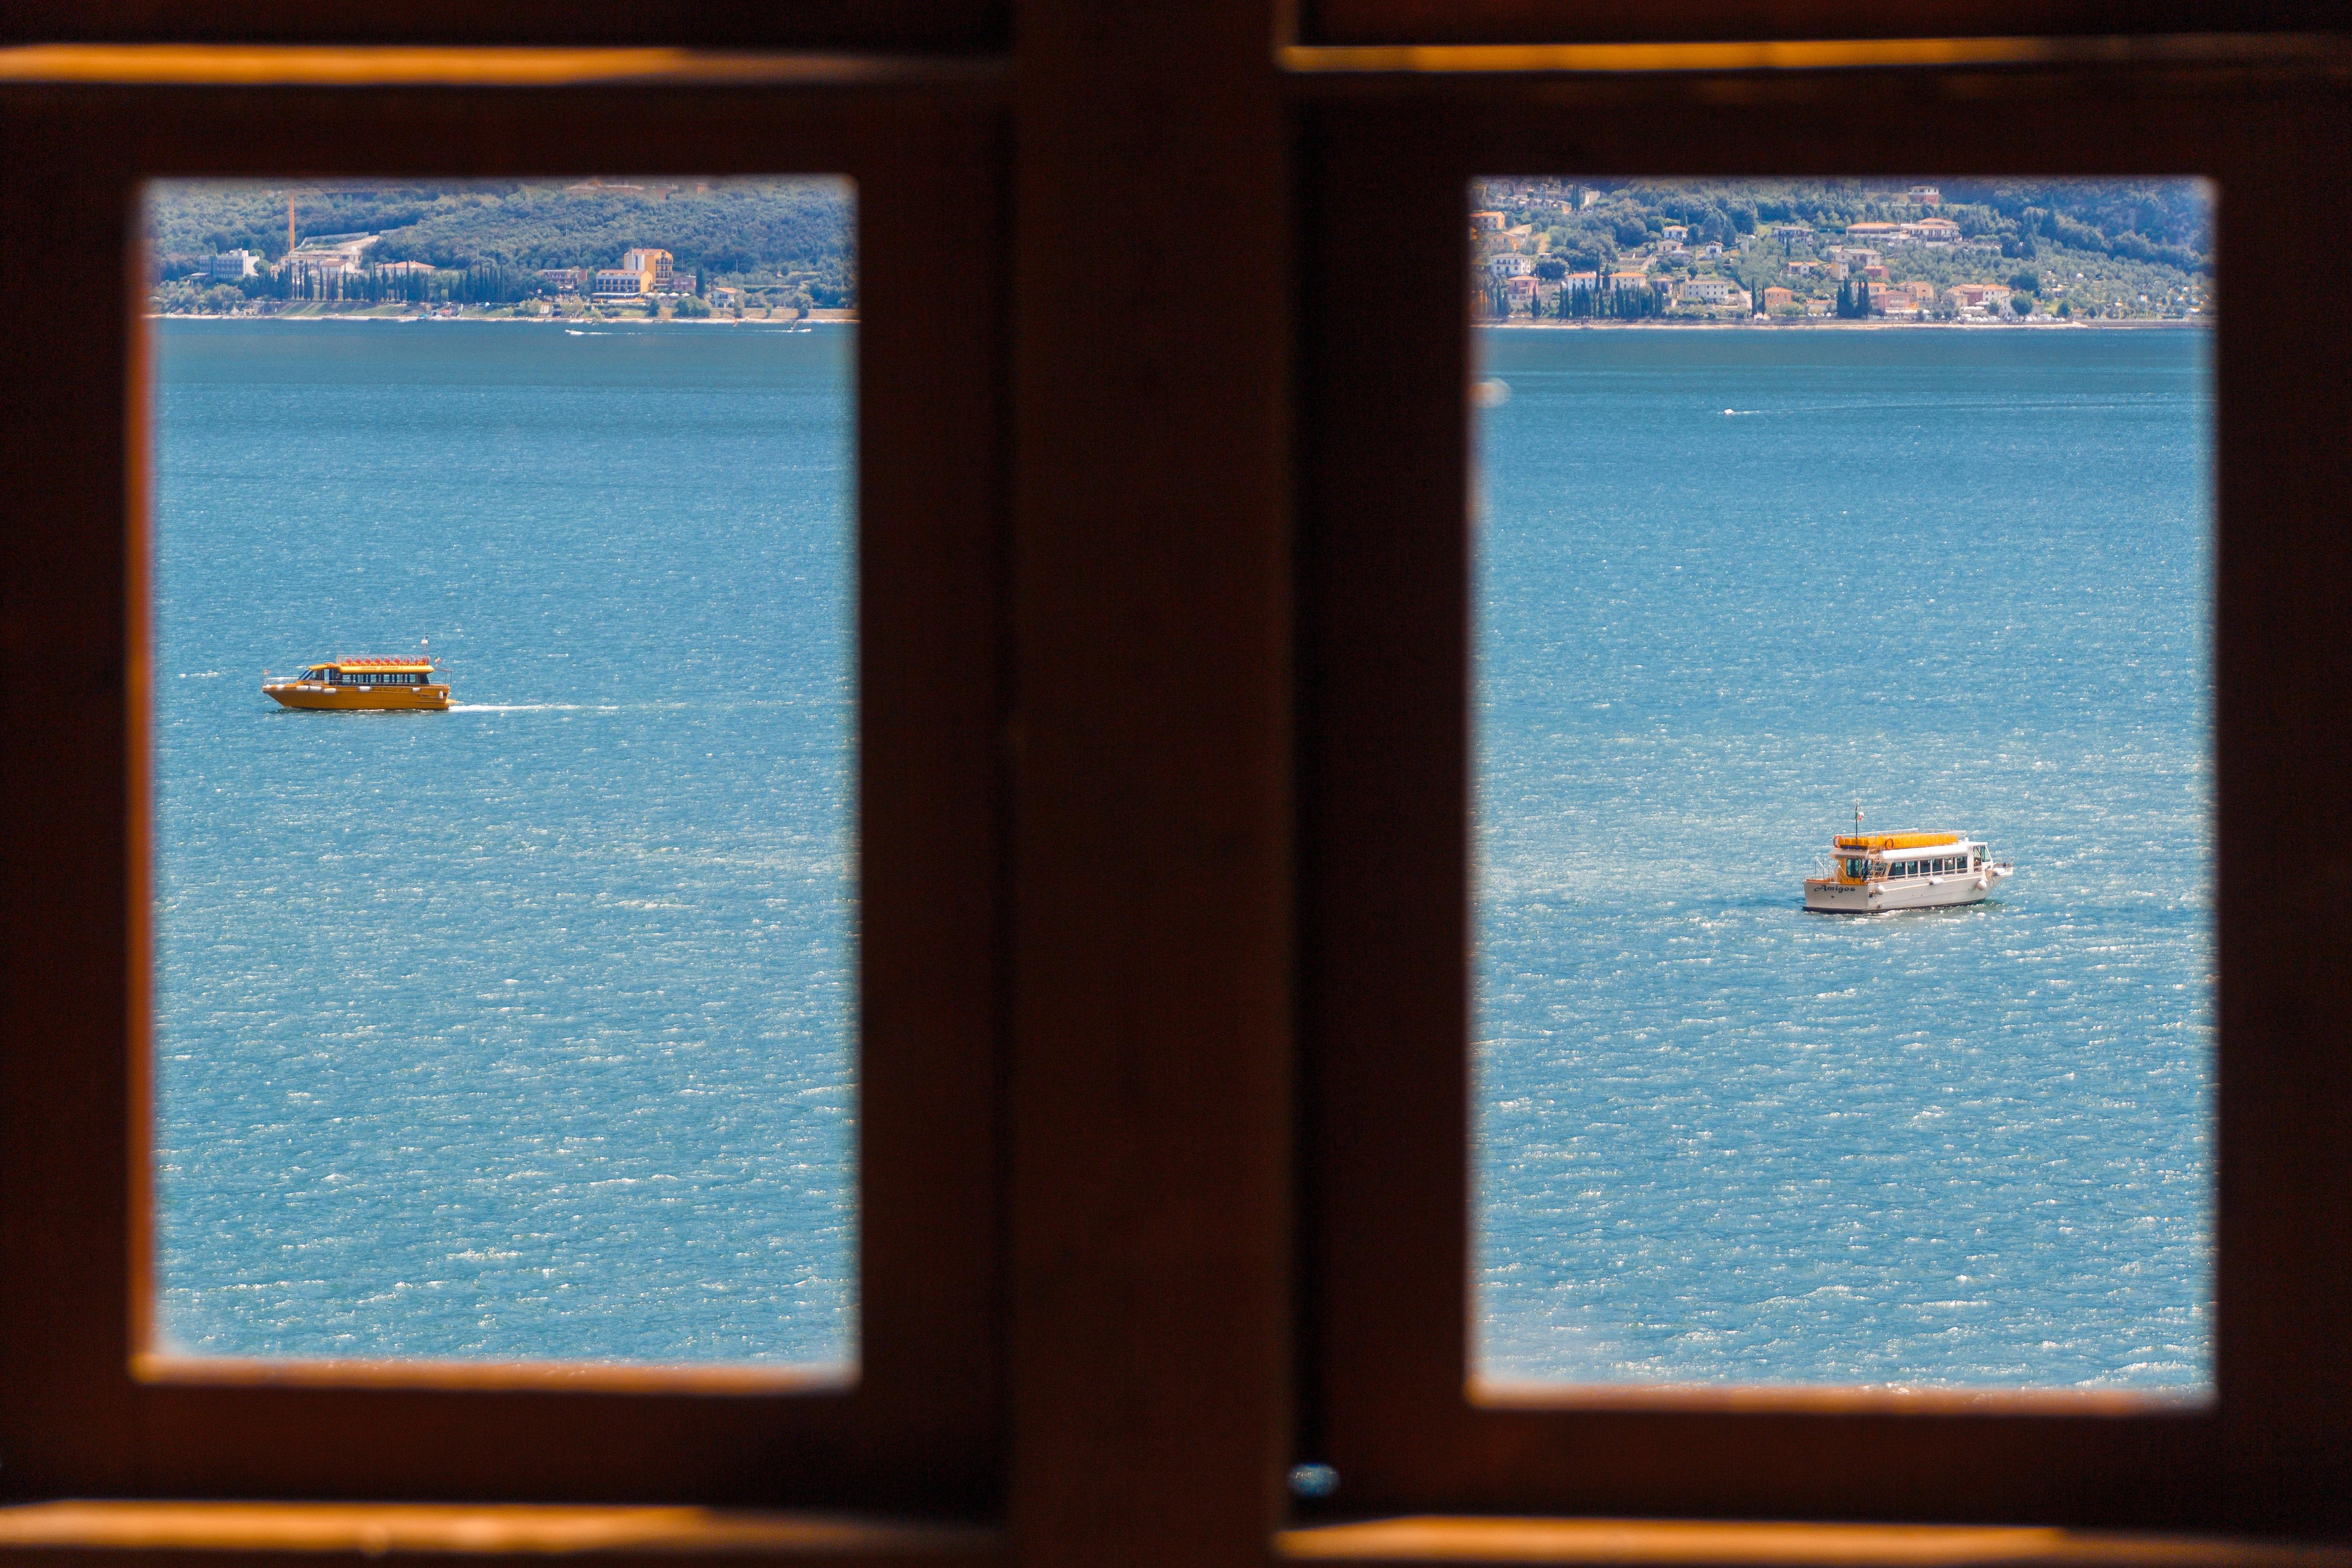 Fotos gratis : ventana, vaso, lago, ver, color, azul, material ...